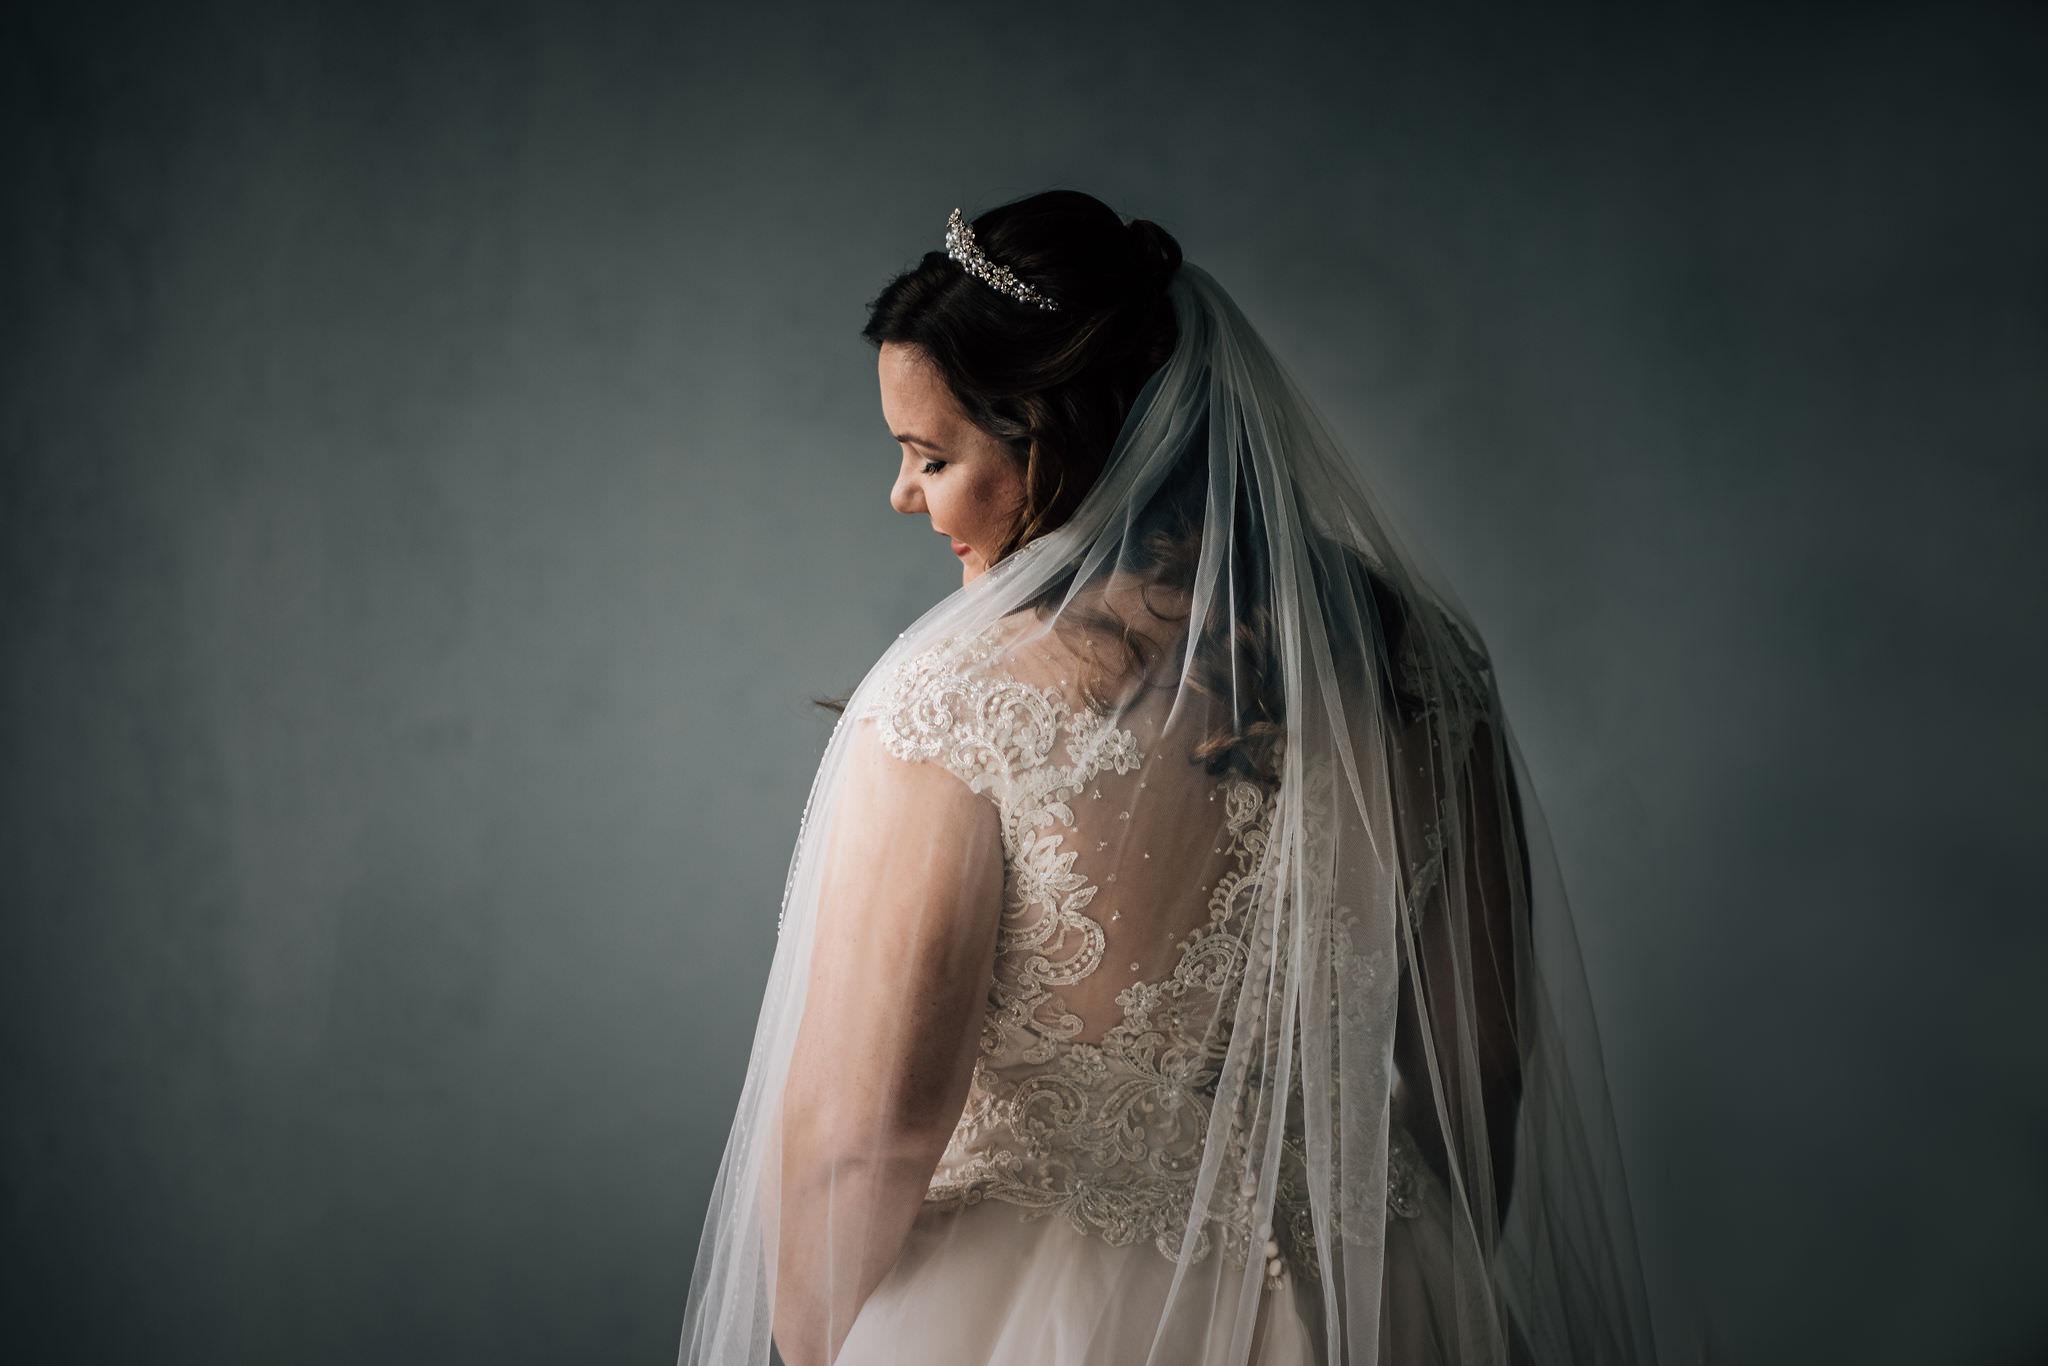 _N857592-Edit_fotografering_larvik_bryllup_aspargesgarden_.jpg